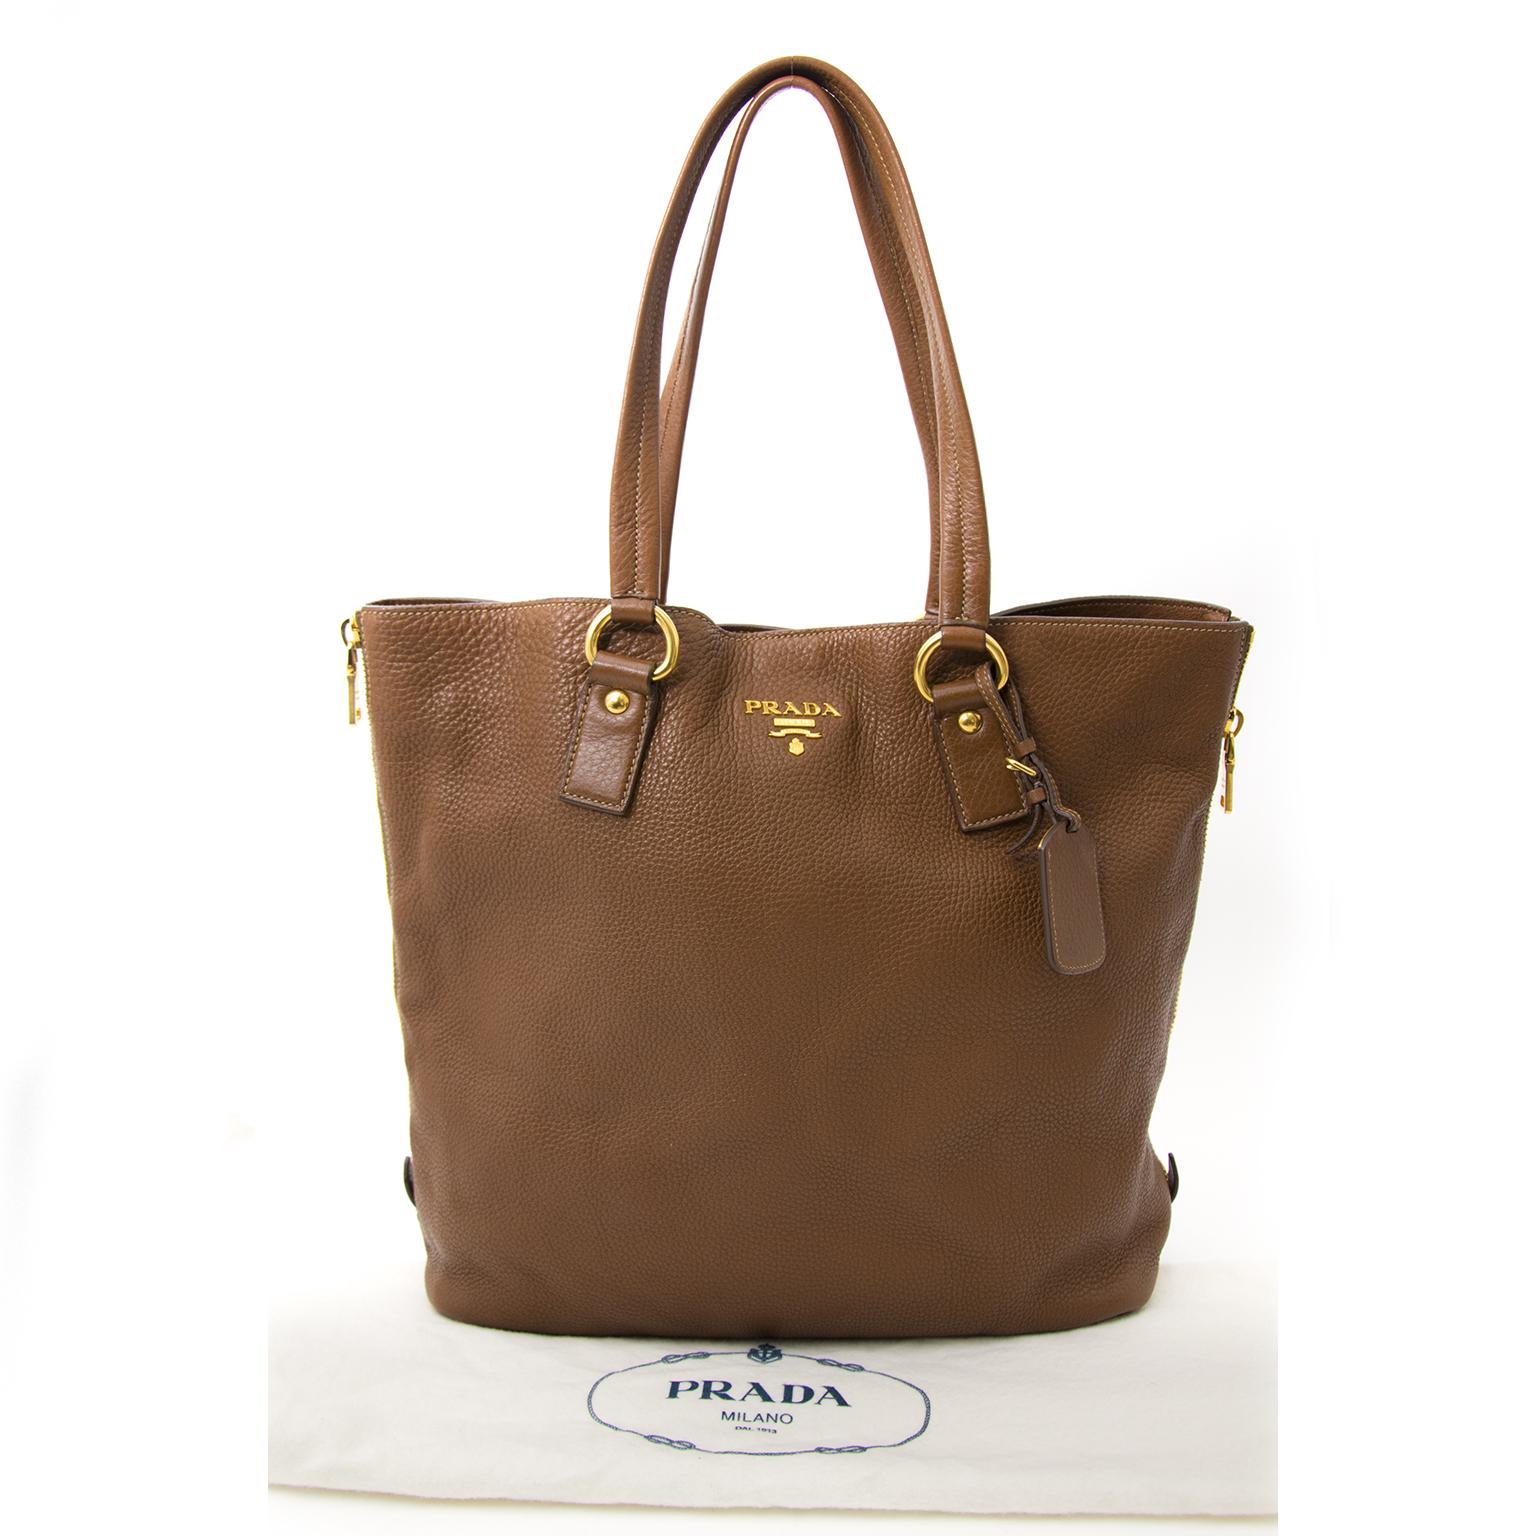 shop real 100% authentic luxury tote aan de beste prijs Prada Chocolat Brown Tote Bag